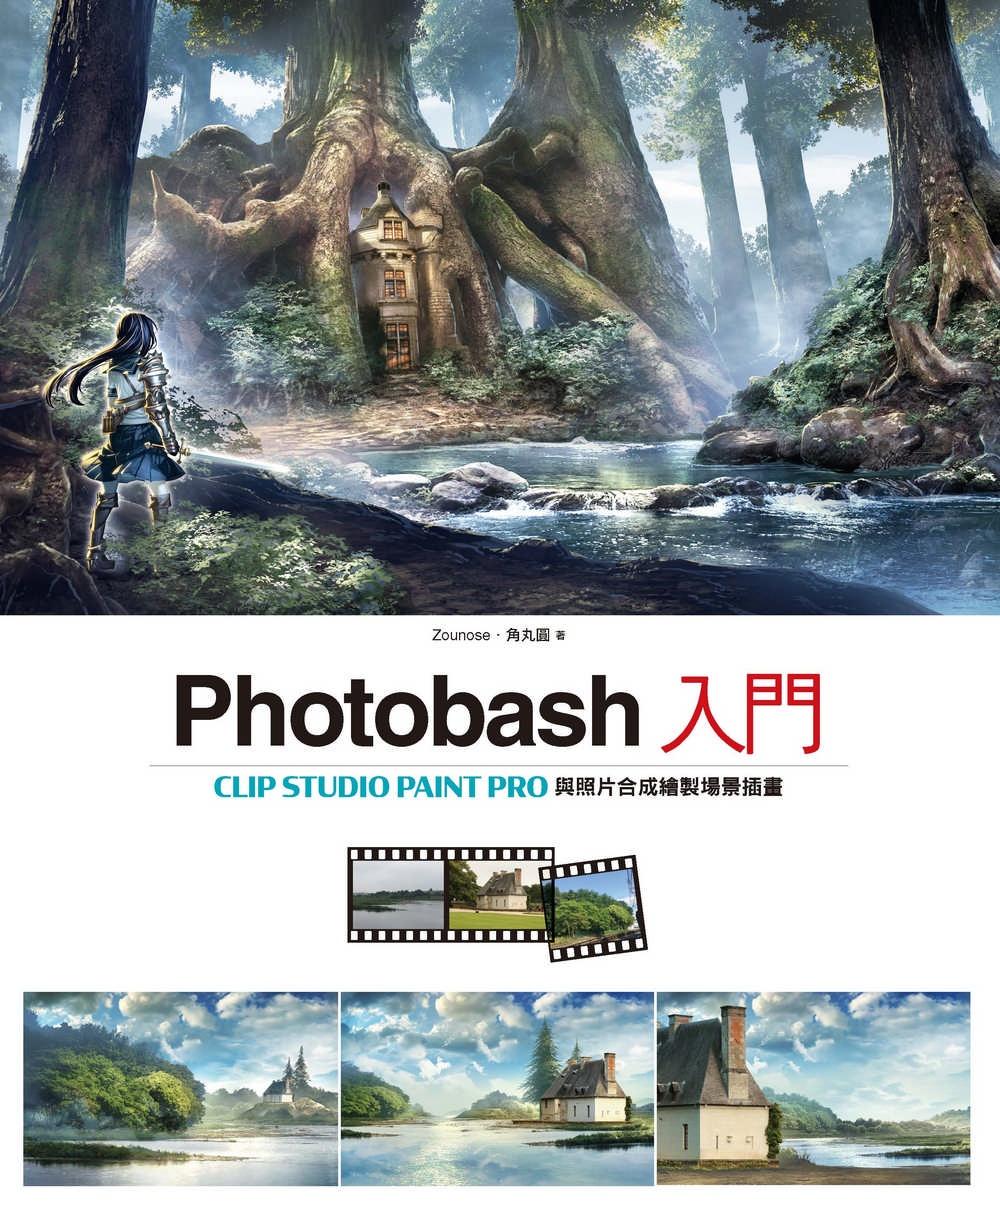 Photobash入門:CLIP STUDIO PAINT PRO與照片合成繪製場景插畫